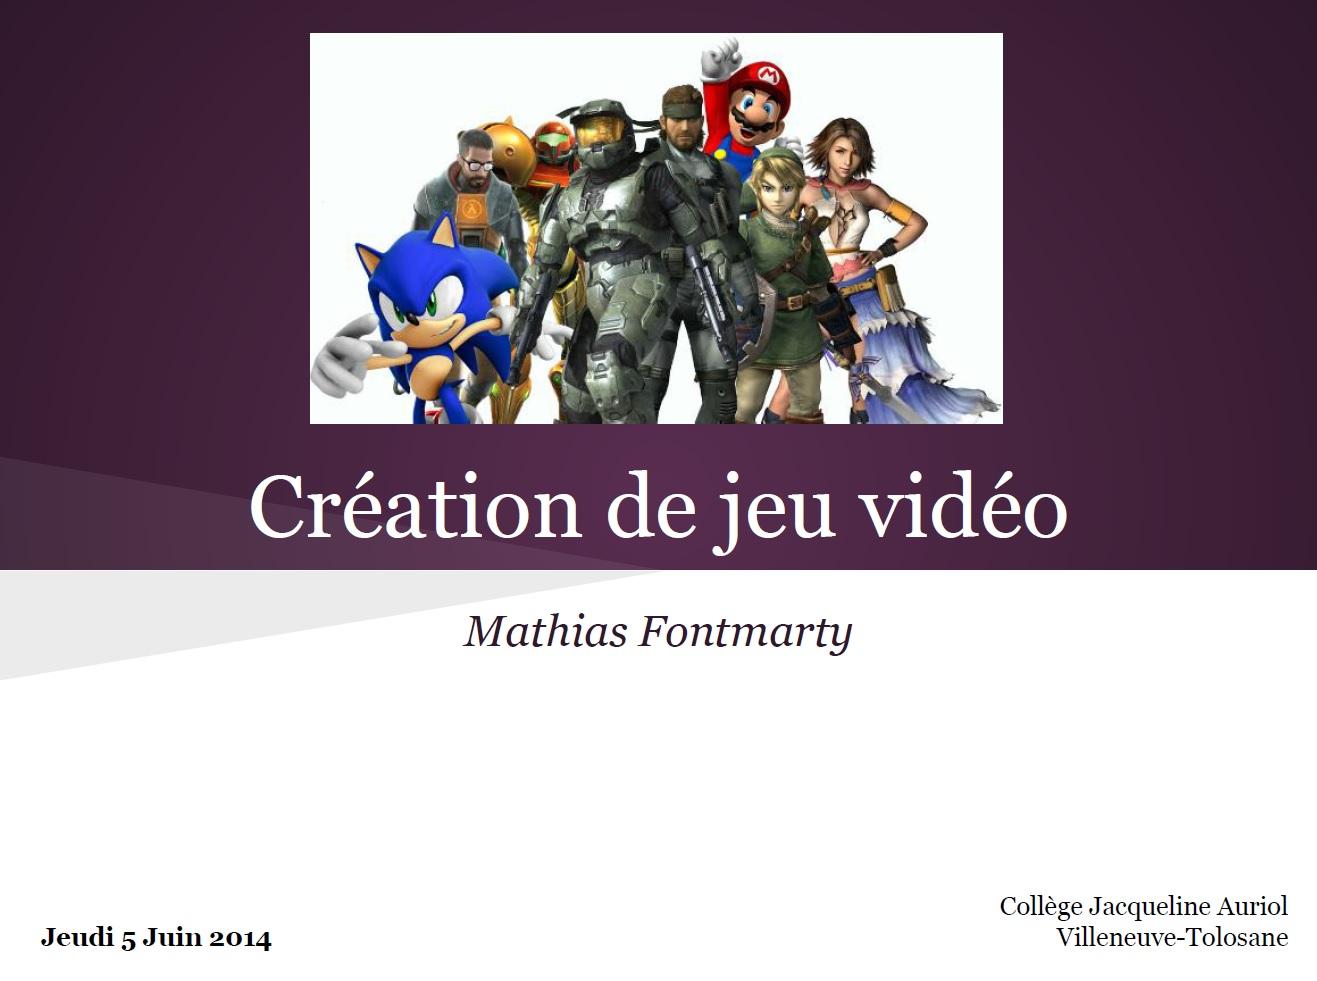 http://www.oneiricworlds.com/siteResources/presentation/creationJeuVideo.pdf